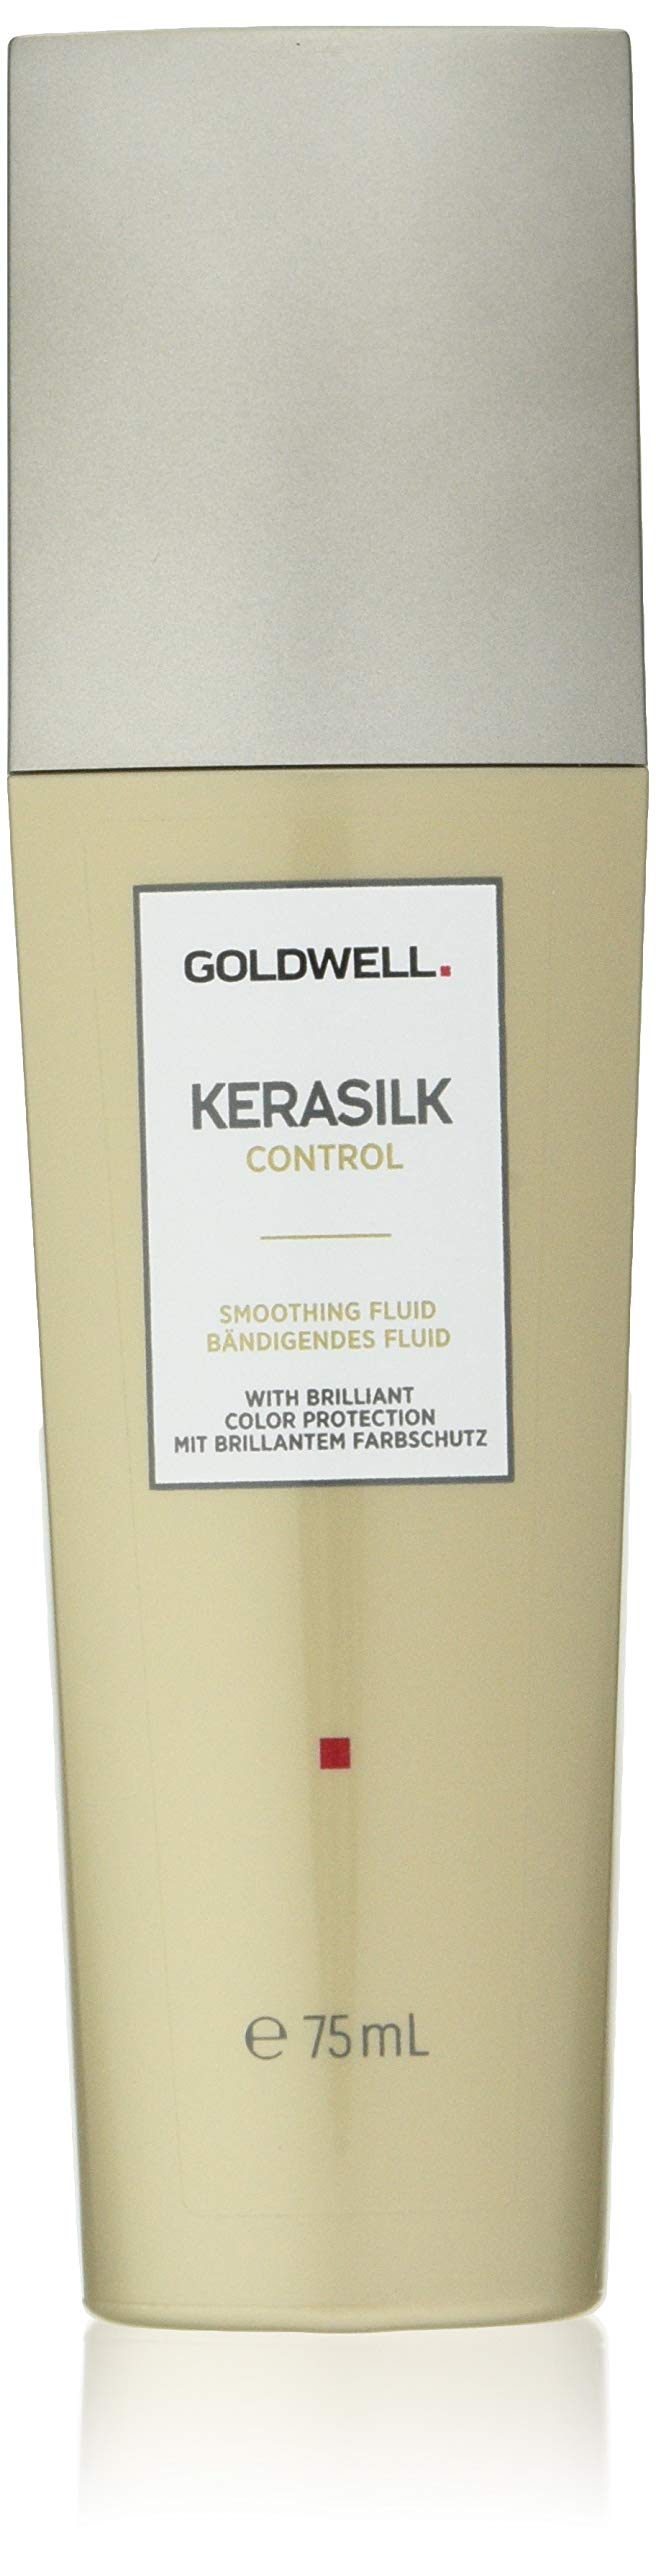 KERASILK Control Smoothing Fluid, 75ml